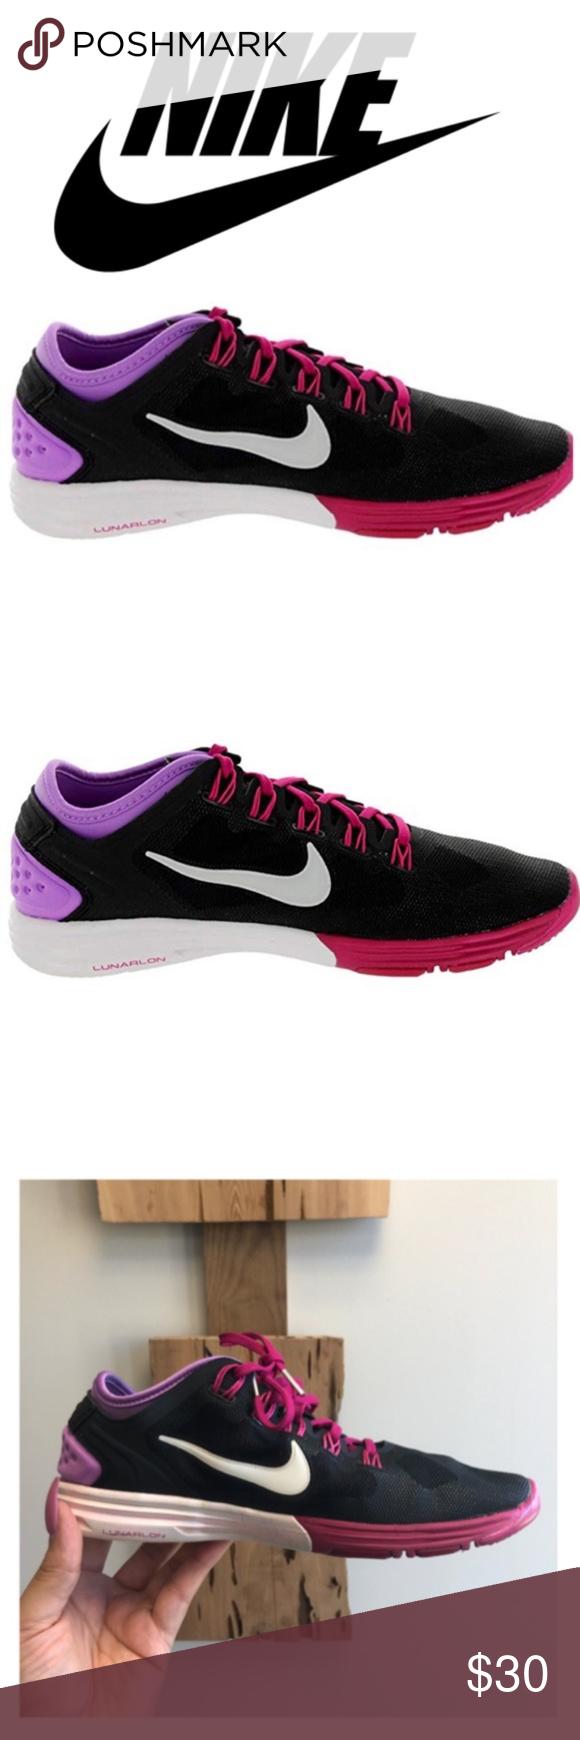 low priced 6aa4a f43c5 Nike Lunarlon Size 7.5 Size  7.5, Color  Black Purple Pink White. Excellent